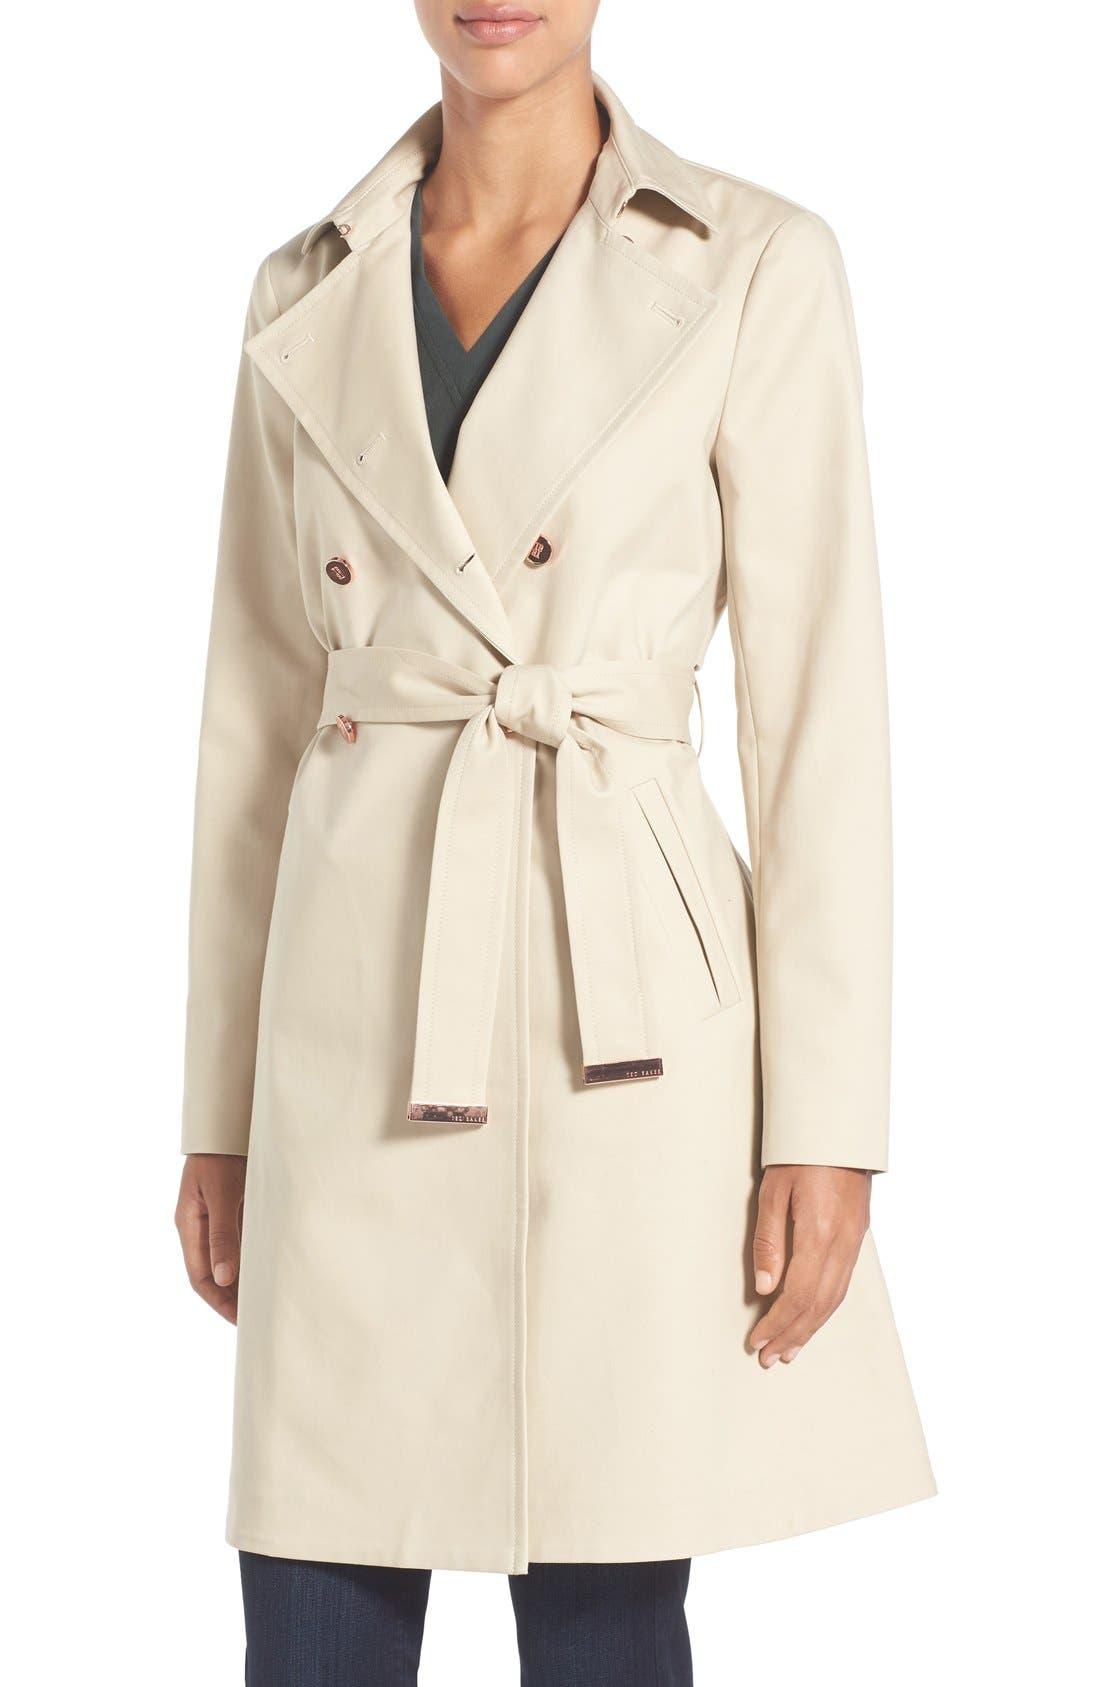 TED BAKER LONDON Flared Skirt Trench Coat, Main, color, 253